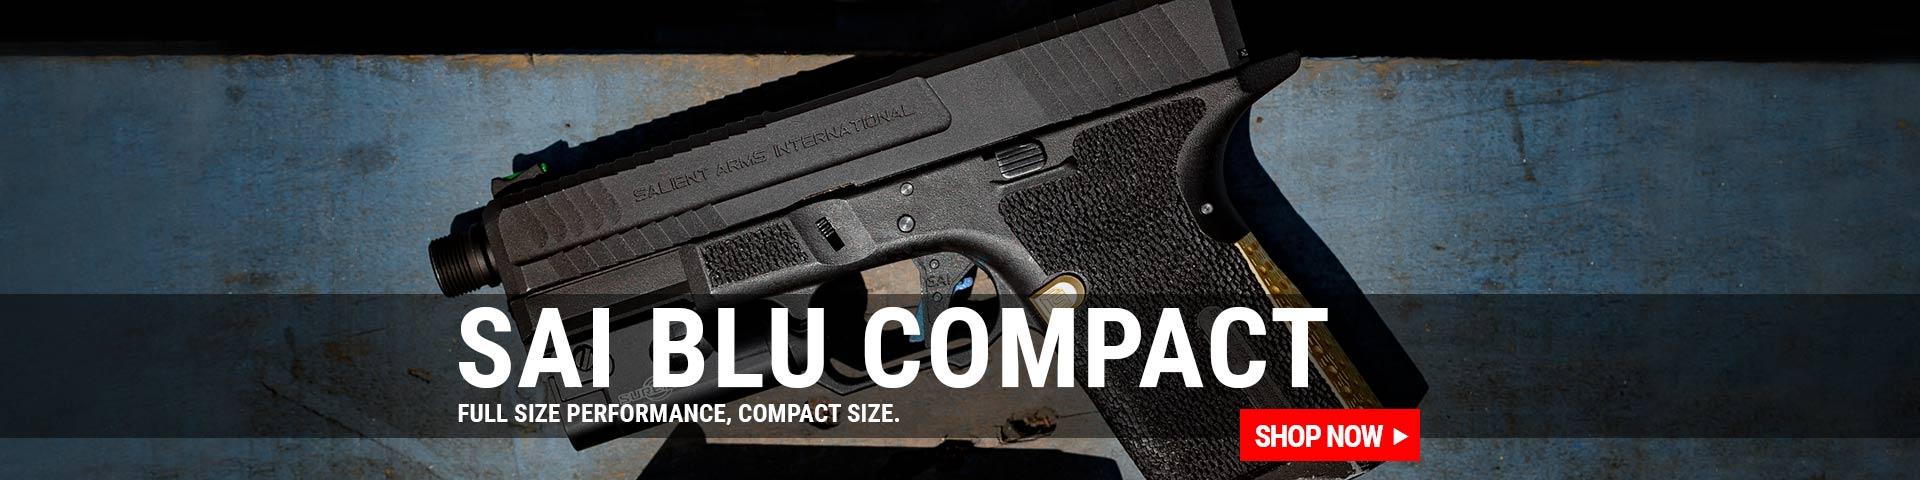 BLU Compact